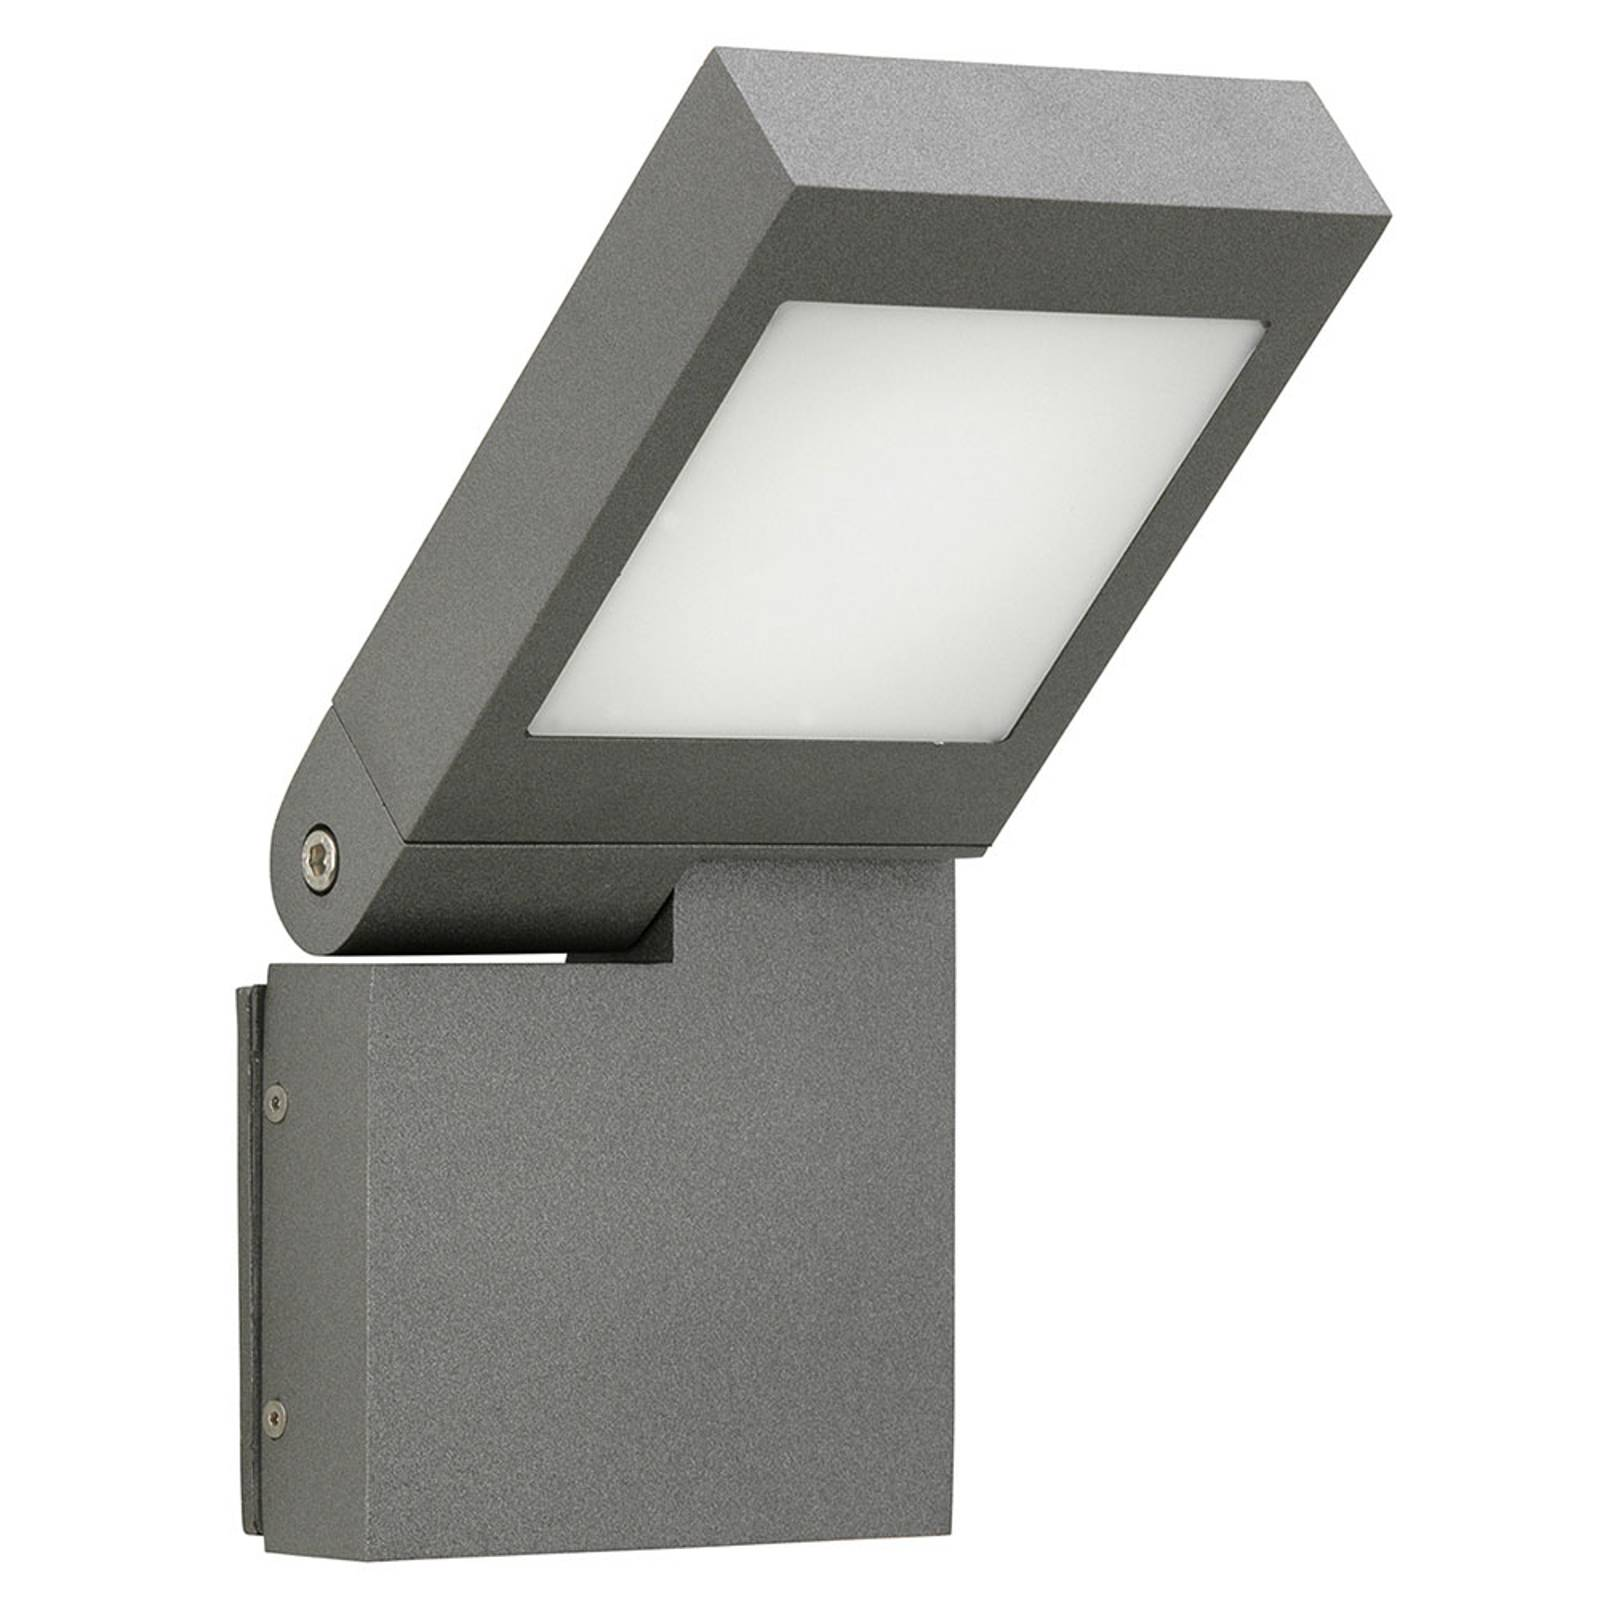 LED-Wandleuchte 0111, Kopf schwenkbar, anthrazit